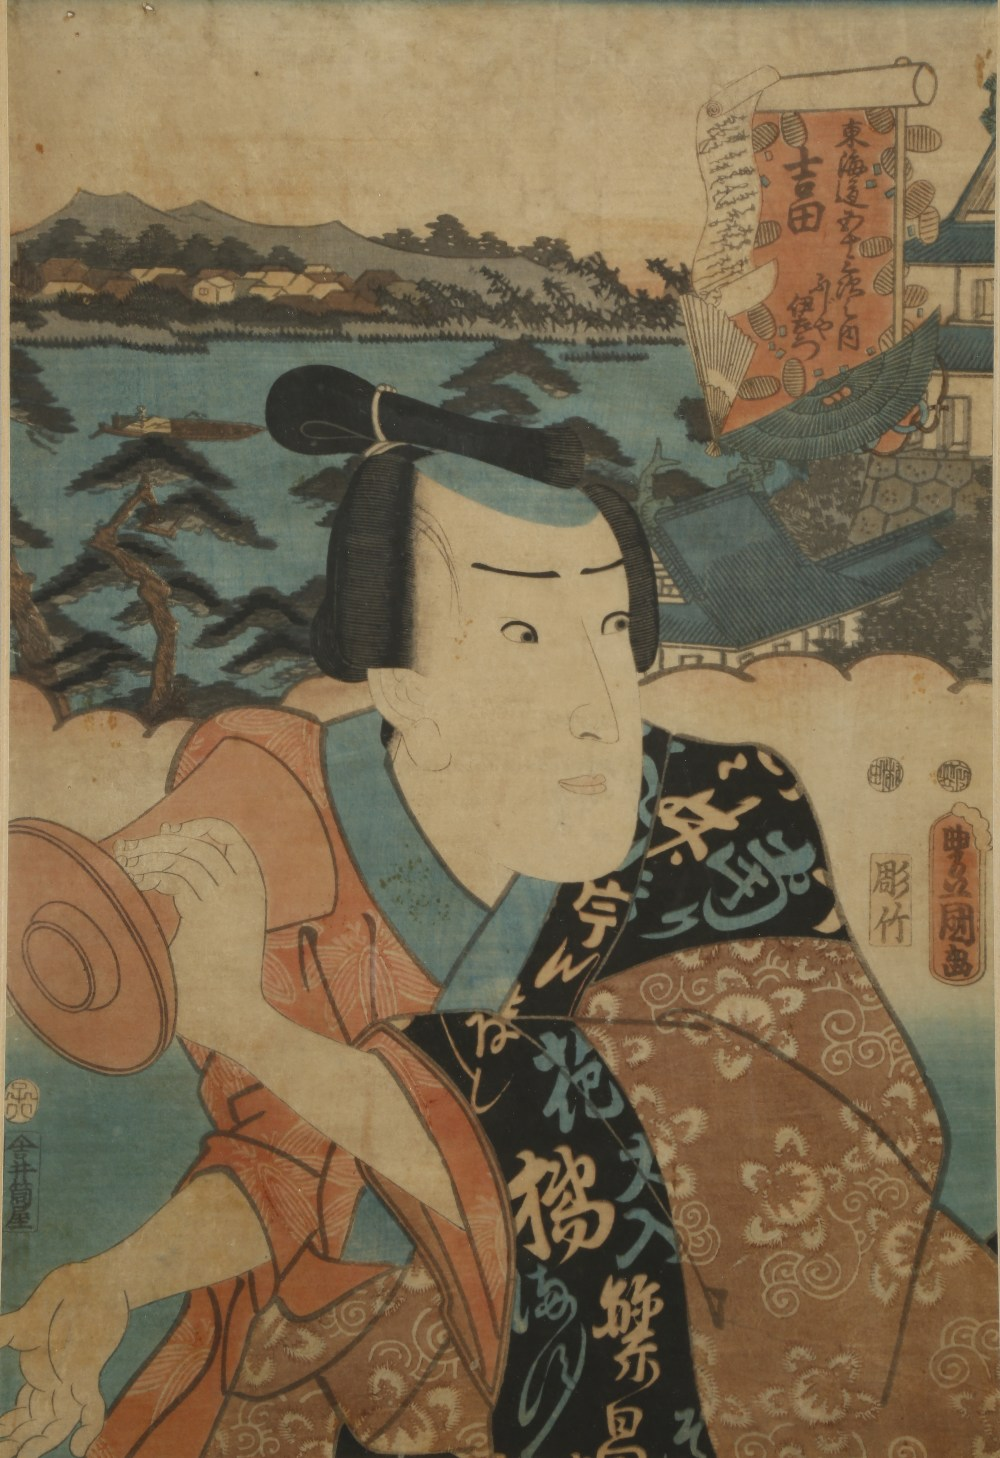 A COLLECTION OF TWELVE JAPANESE WOODBLOCK PRINTS BY UTAGAWA KUNISADA (1786-1864) MEIJI PERIOD, - Image 5 of 12